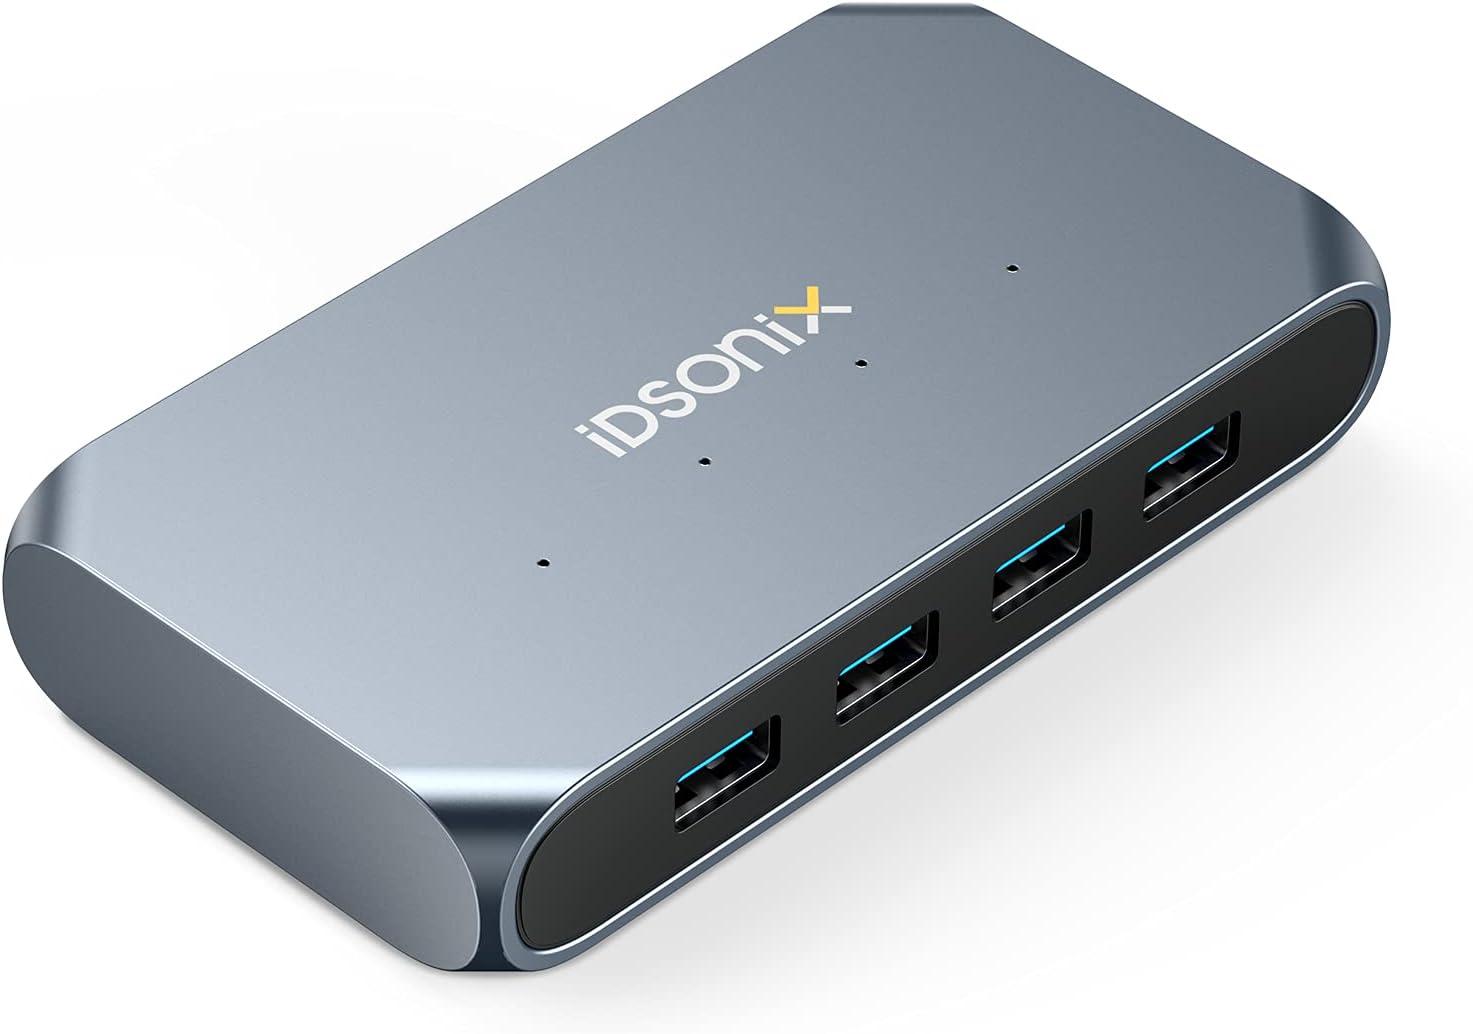 iDsonix USB Hub, 4-Port 12V / 2A Powered USB 3.0 Hubs, 5Gbps Data Transfer USB-A Hub, Aluminum Alloy USB Data Hub for Laptop, MacBook, Mac Pro, iMac, Surface Pro, PC, HDD, SSD, Printer, Camera, ect.